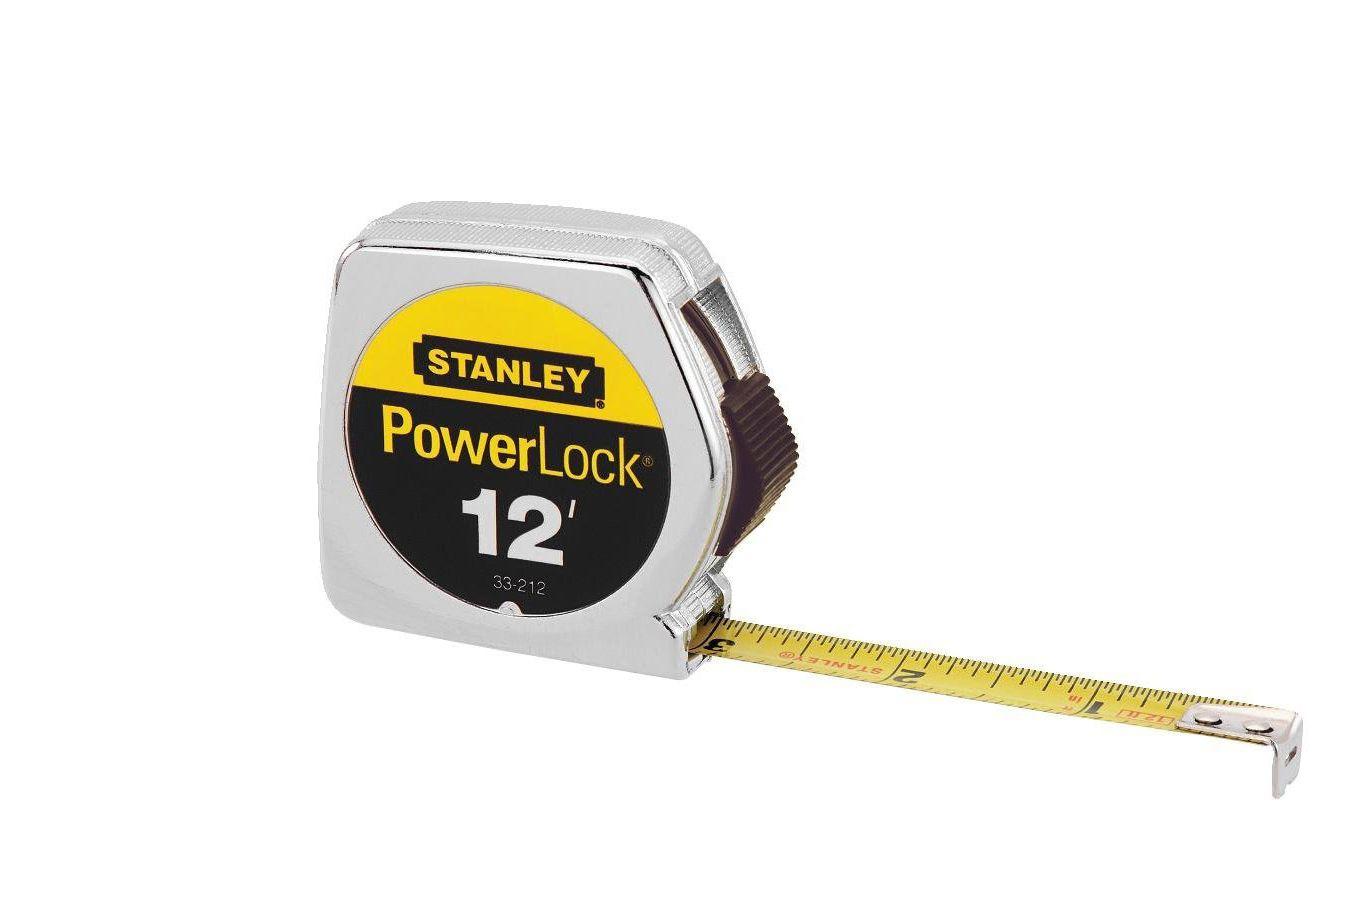 Stanley PowerLock 12'